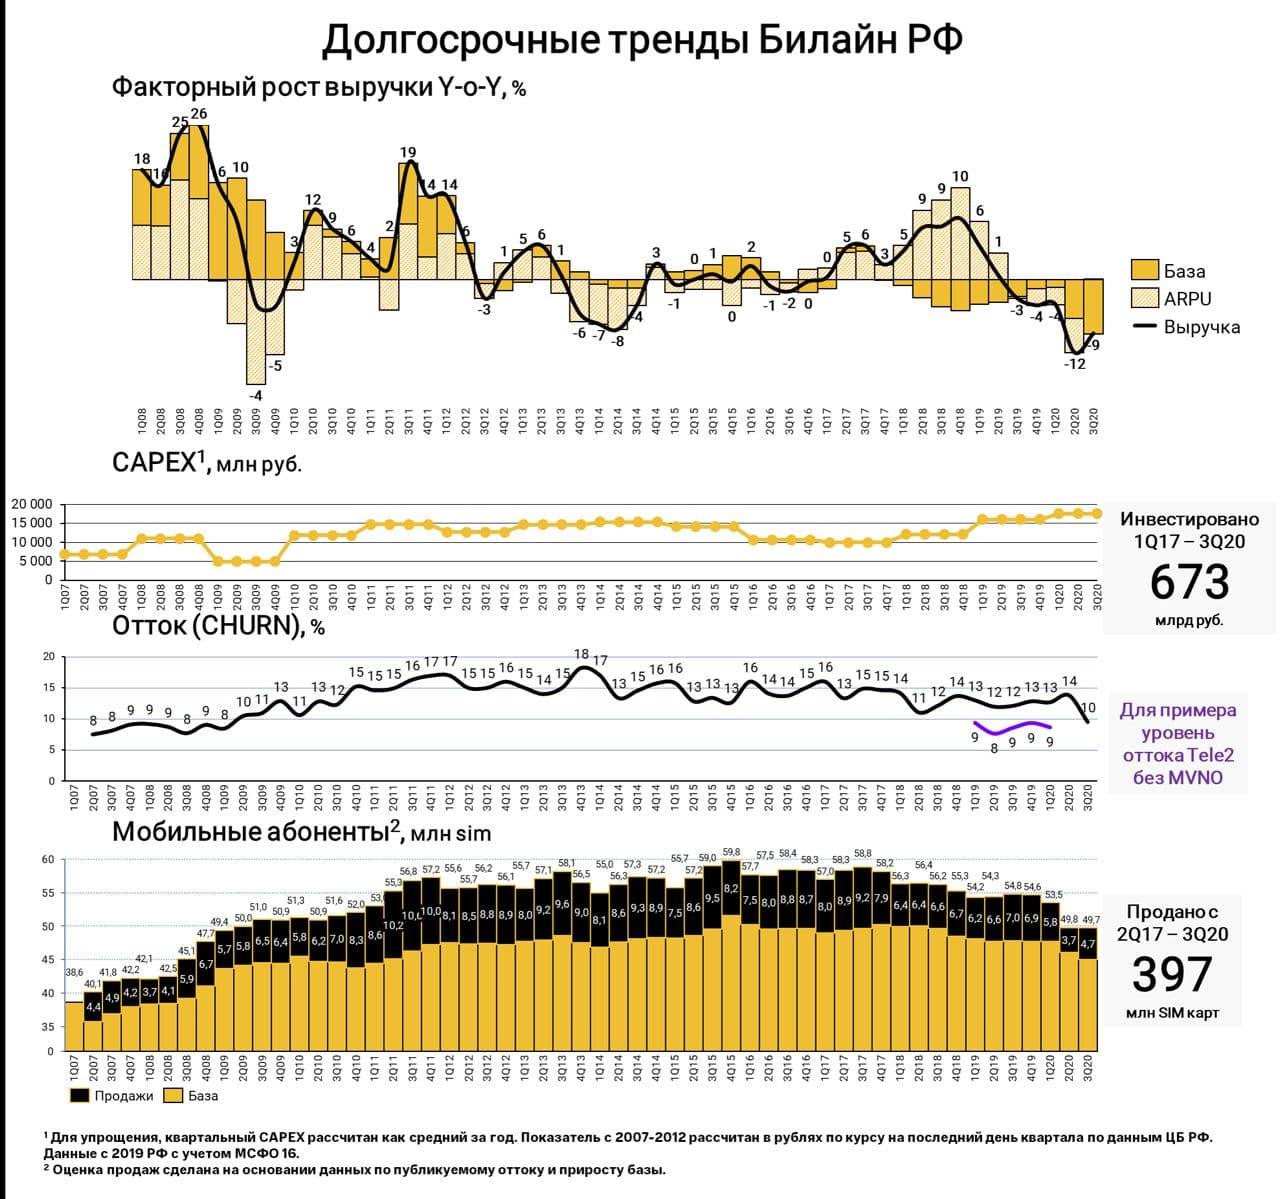 Общая выручка Билайн снизилась на 7% 2